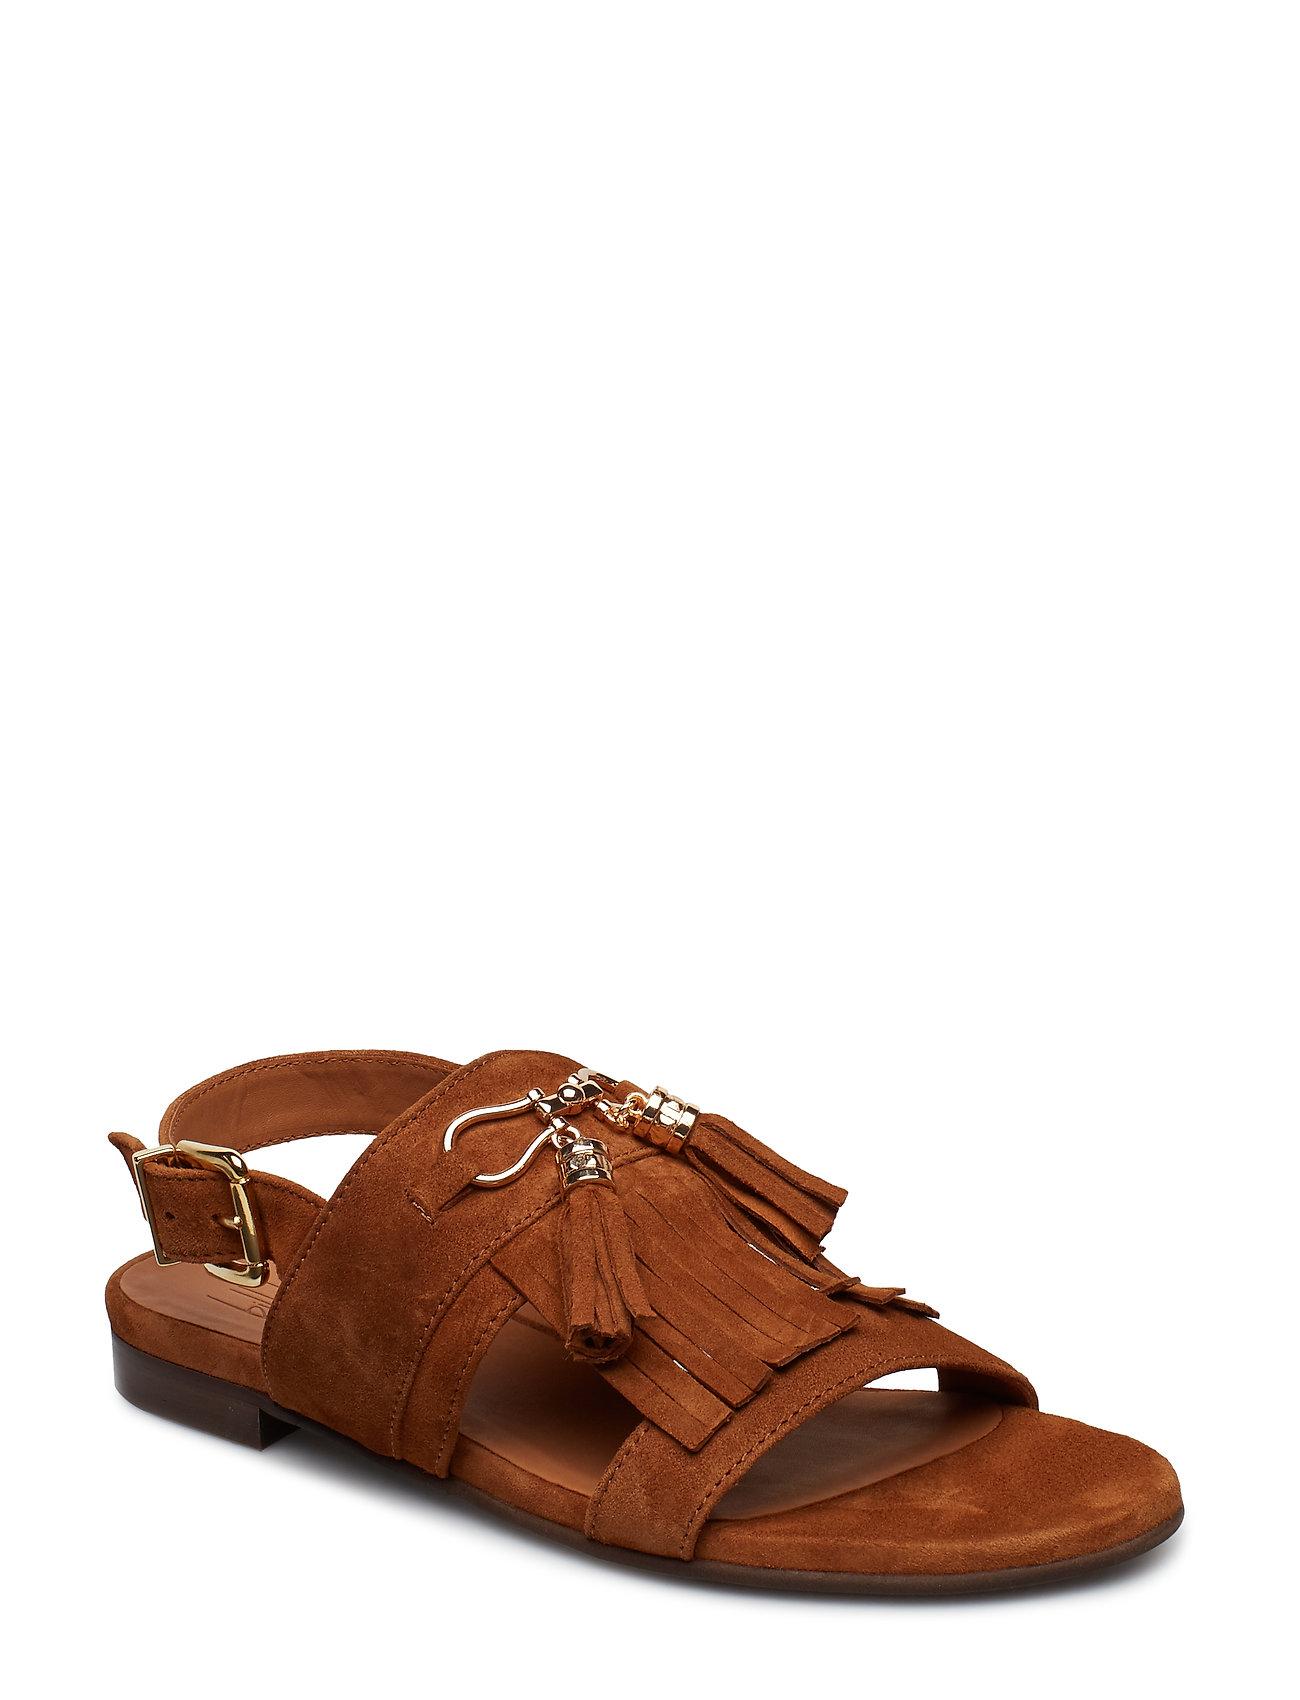 5f35ba80e4c Billi Bi Sandals 8705 (Cognac Suede/gold 562), (111.75 €) | Large ...